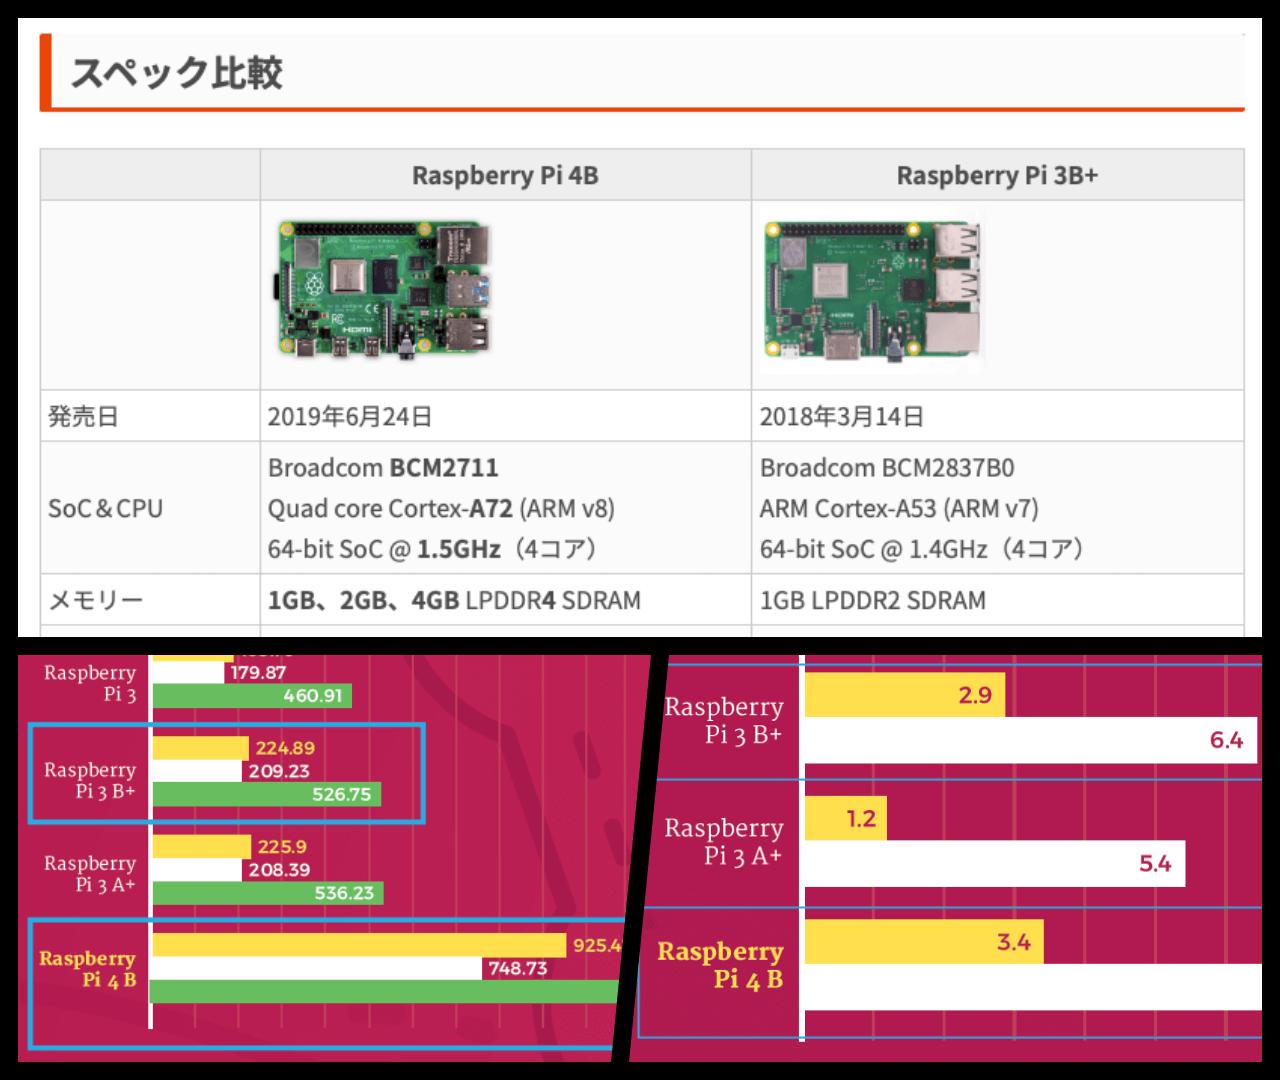 Raspberry Pi 4Bと3B+の比較